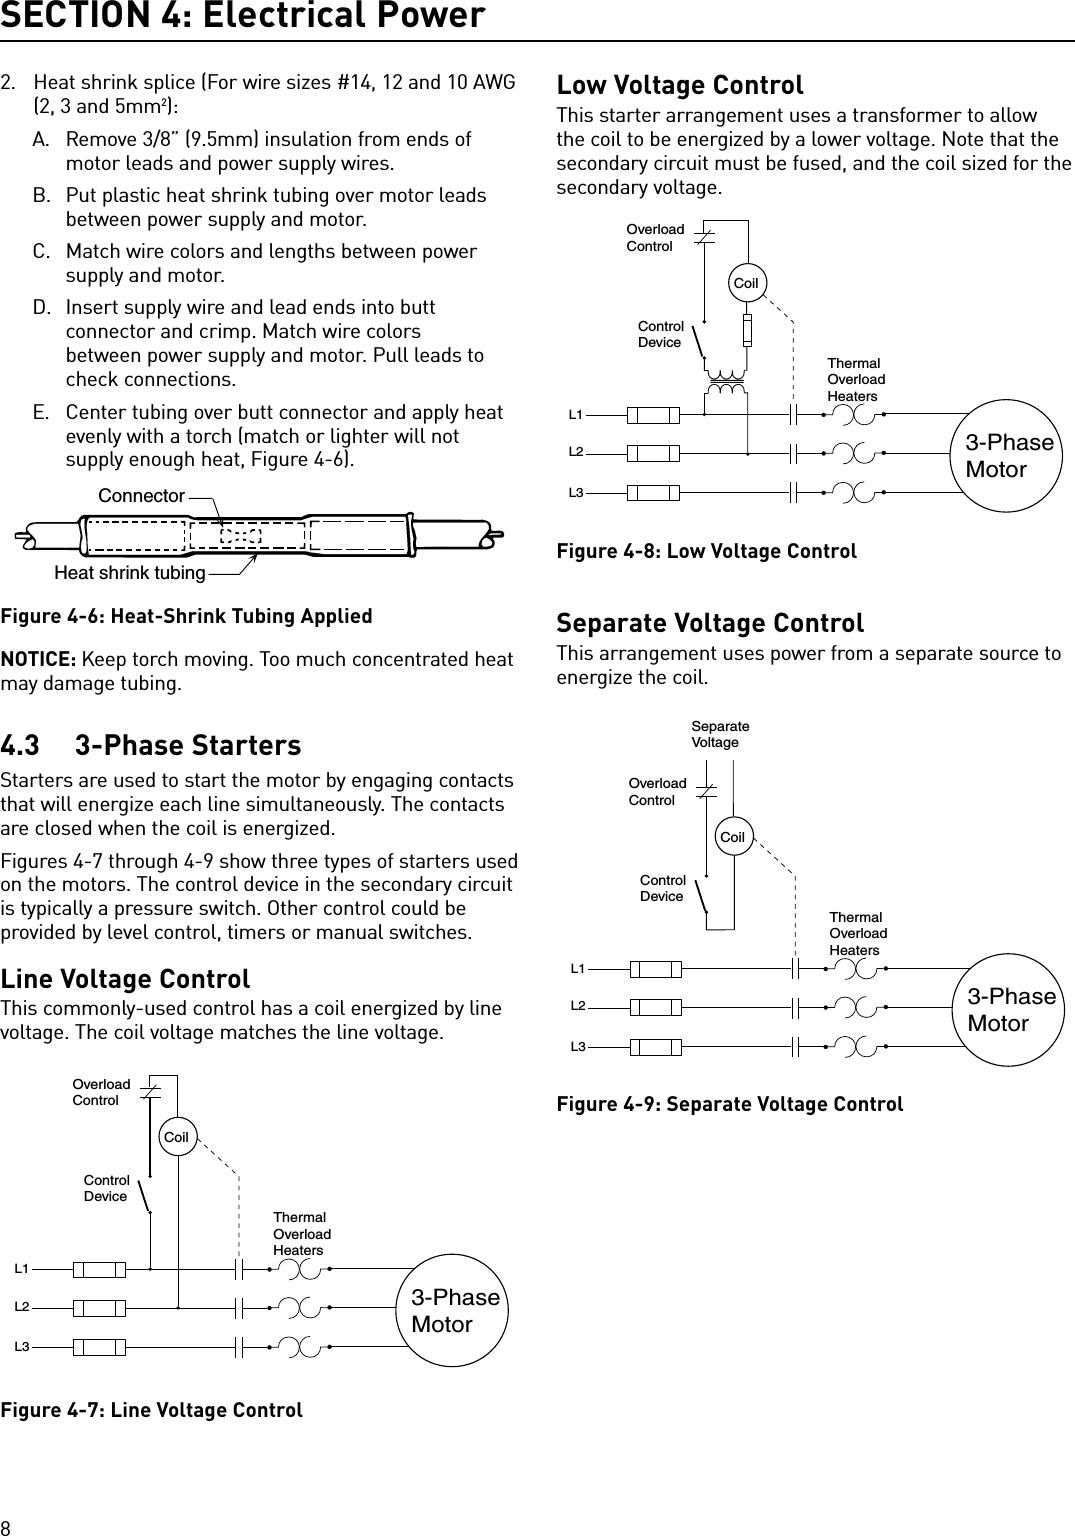 Start Stop Switch Wiring Diagram In Addition 3 Phase Motor Starter